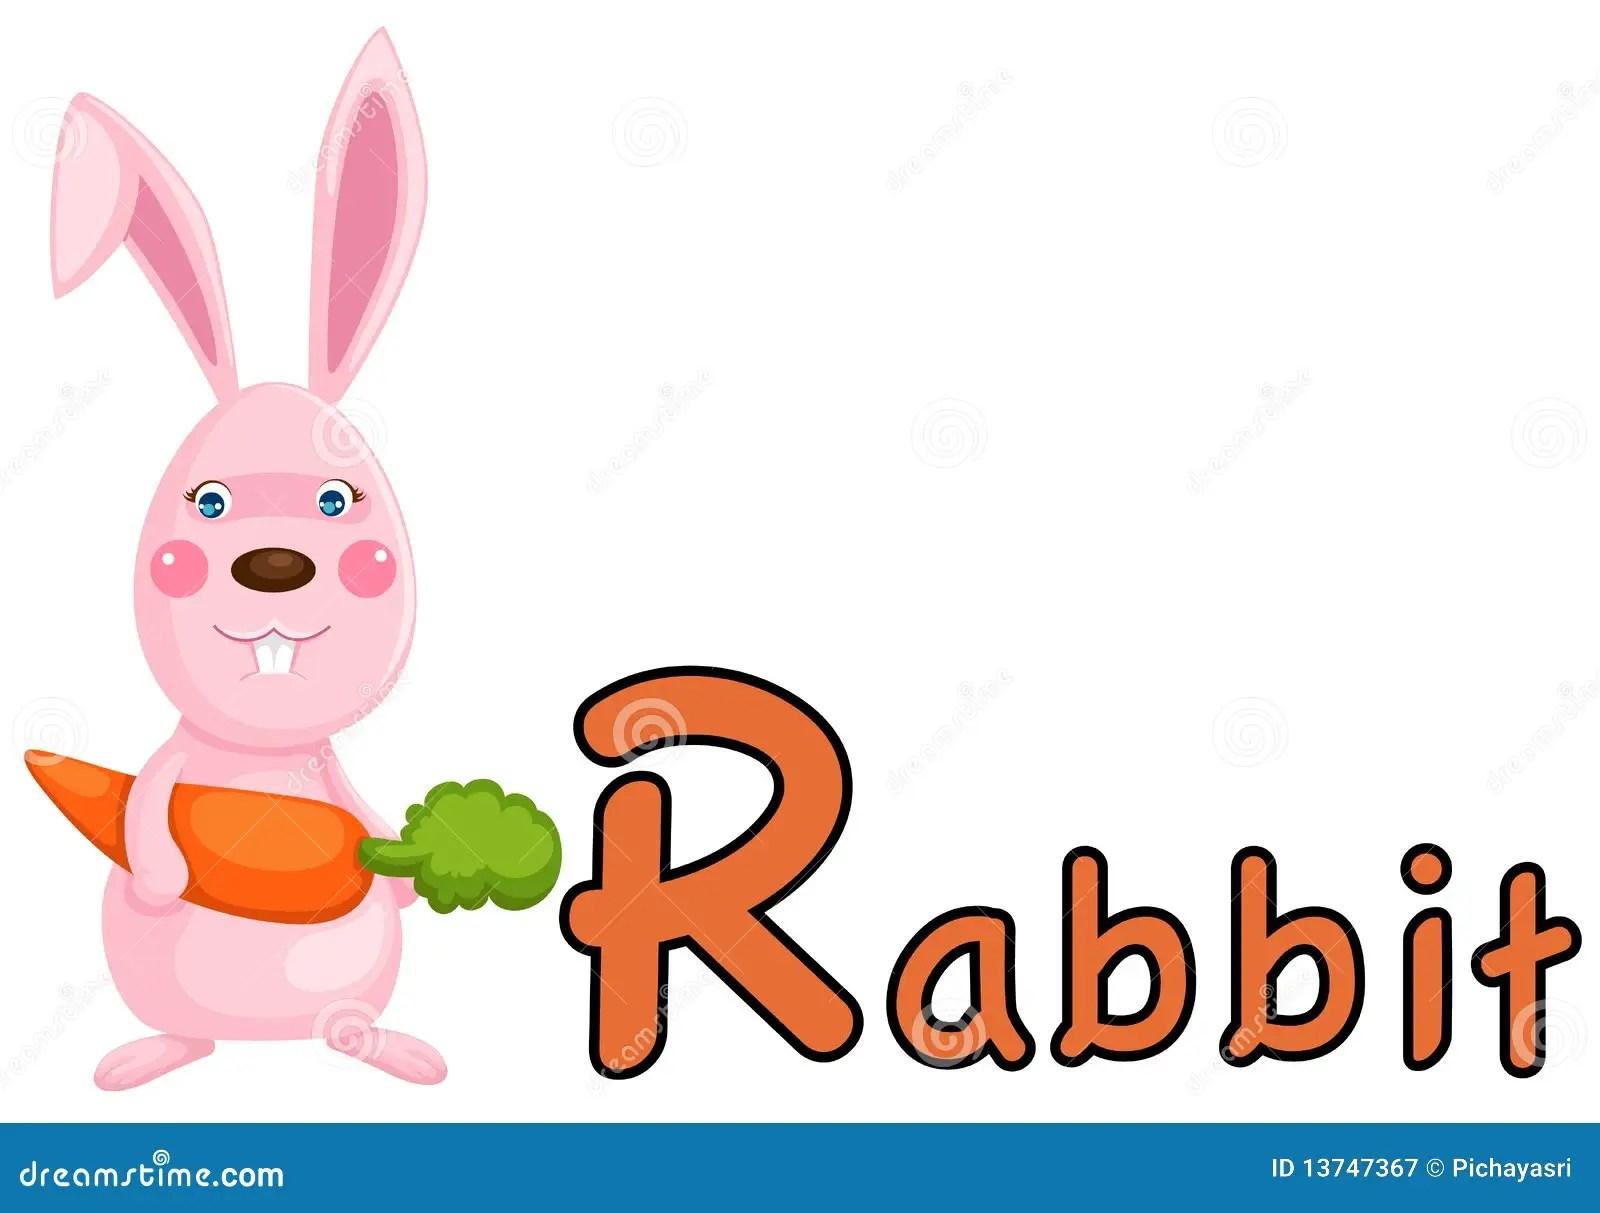 Animal Alphabet R For Rabbit Royalty Free Stock